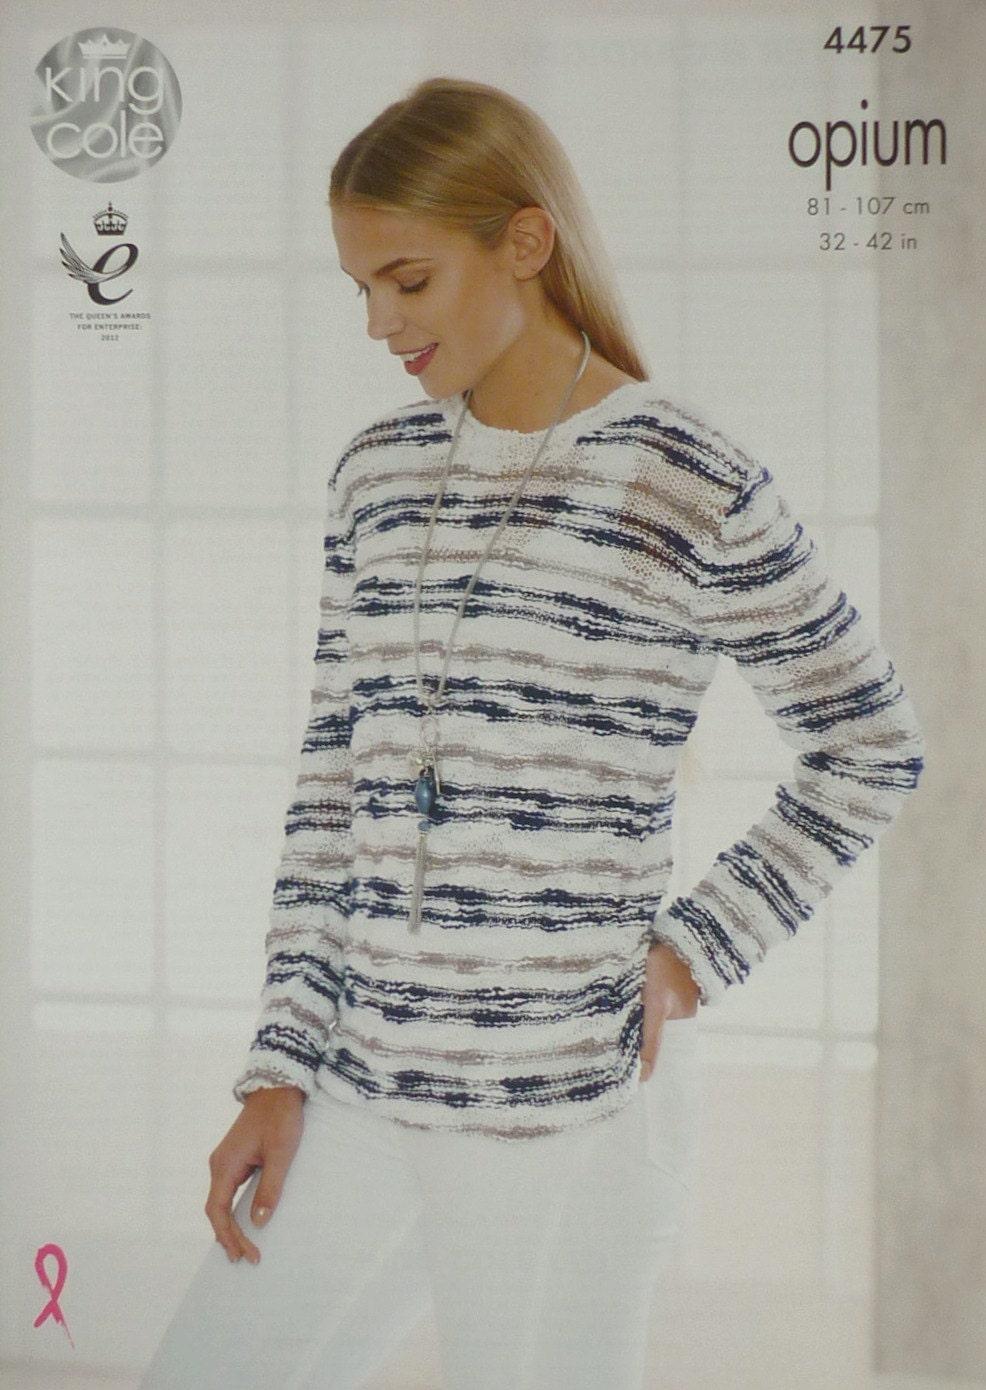 83dc740e7 Womens Knitting Pattern K4475 Ladies Long Sleeve Striped Round ...